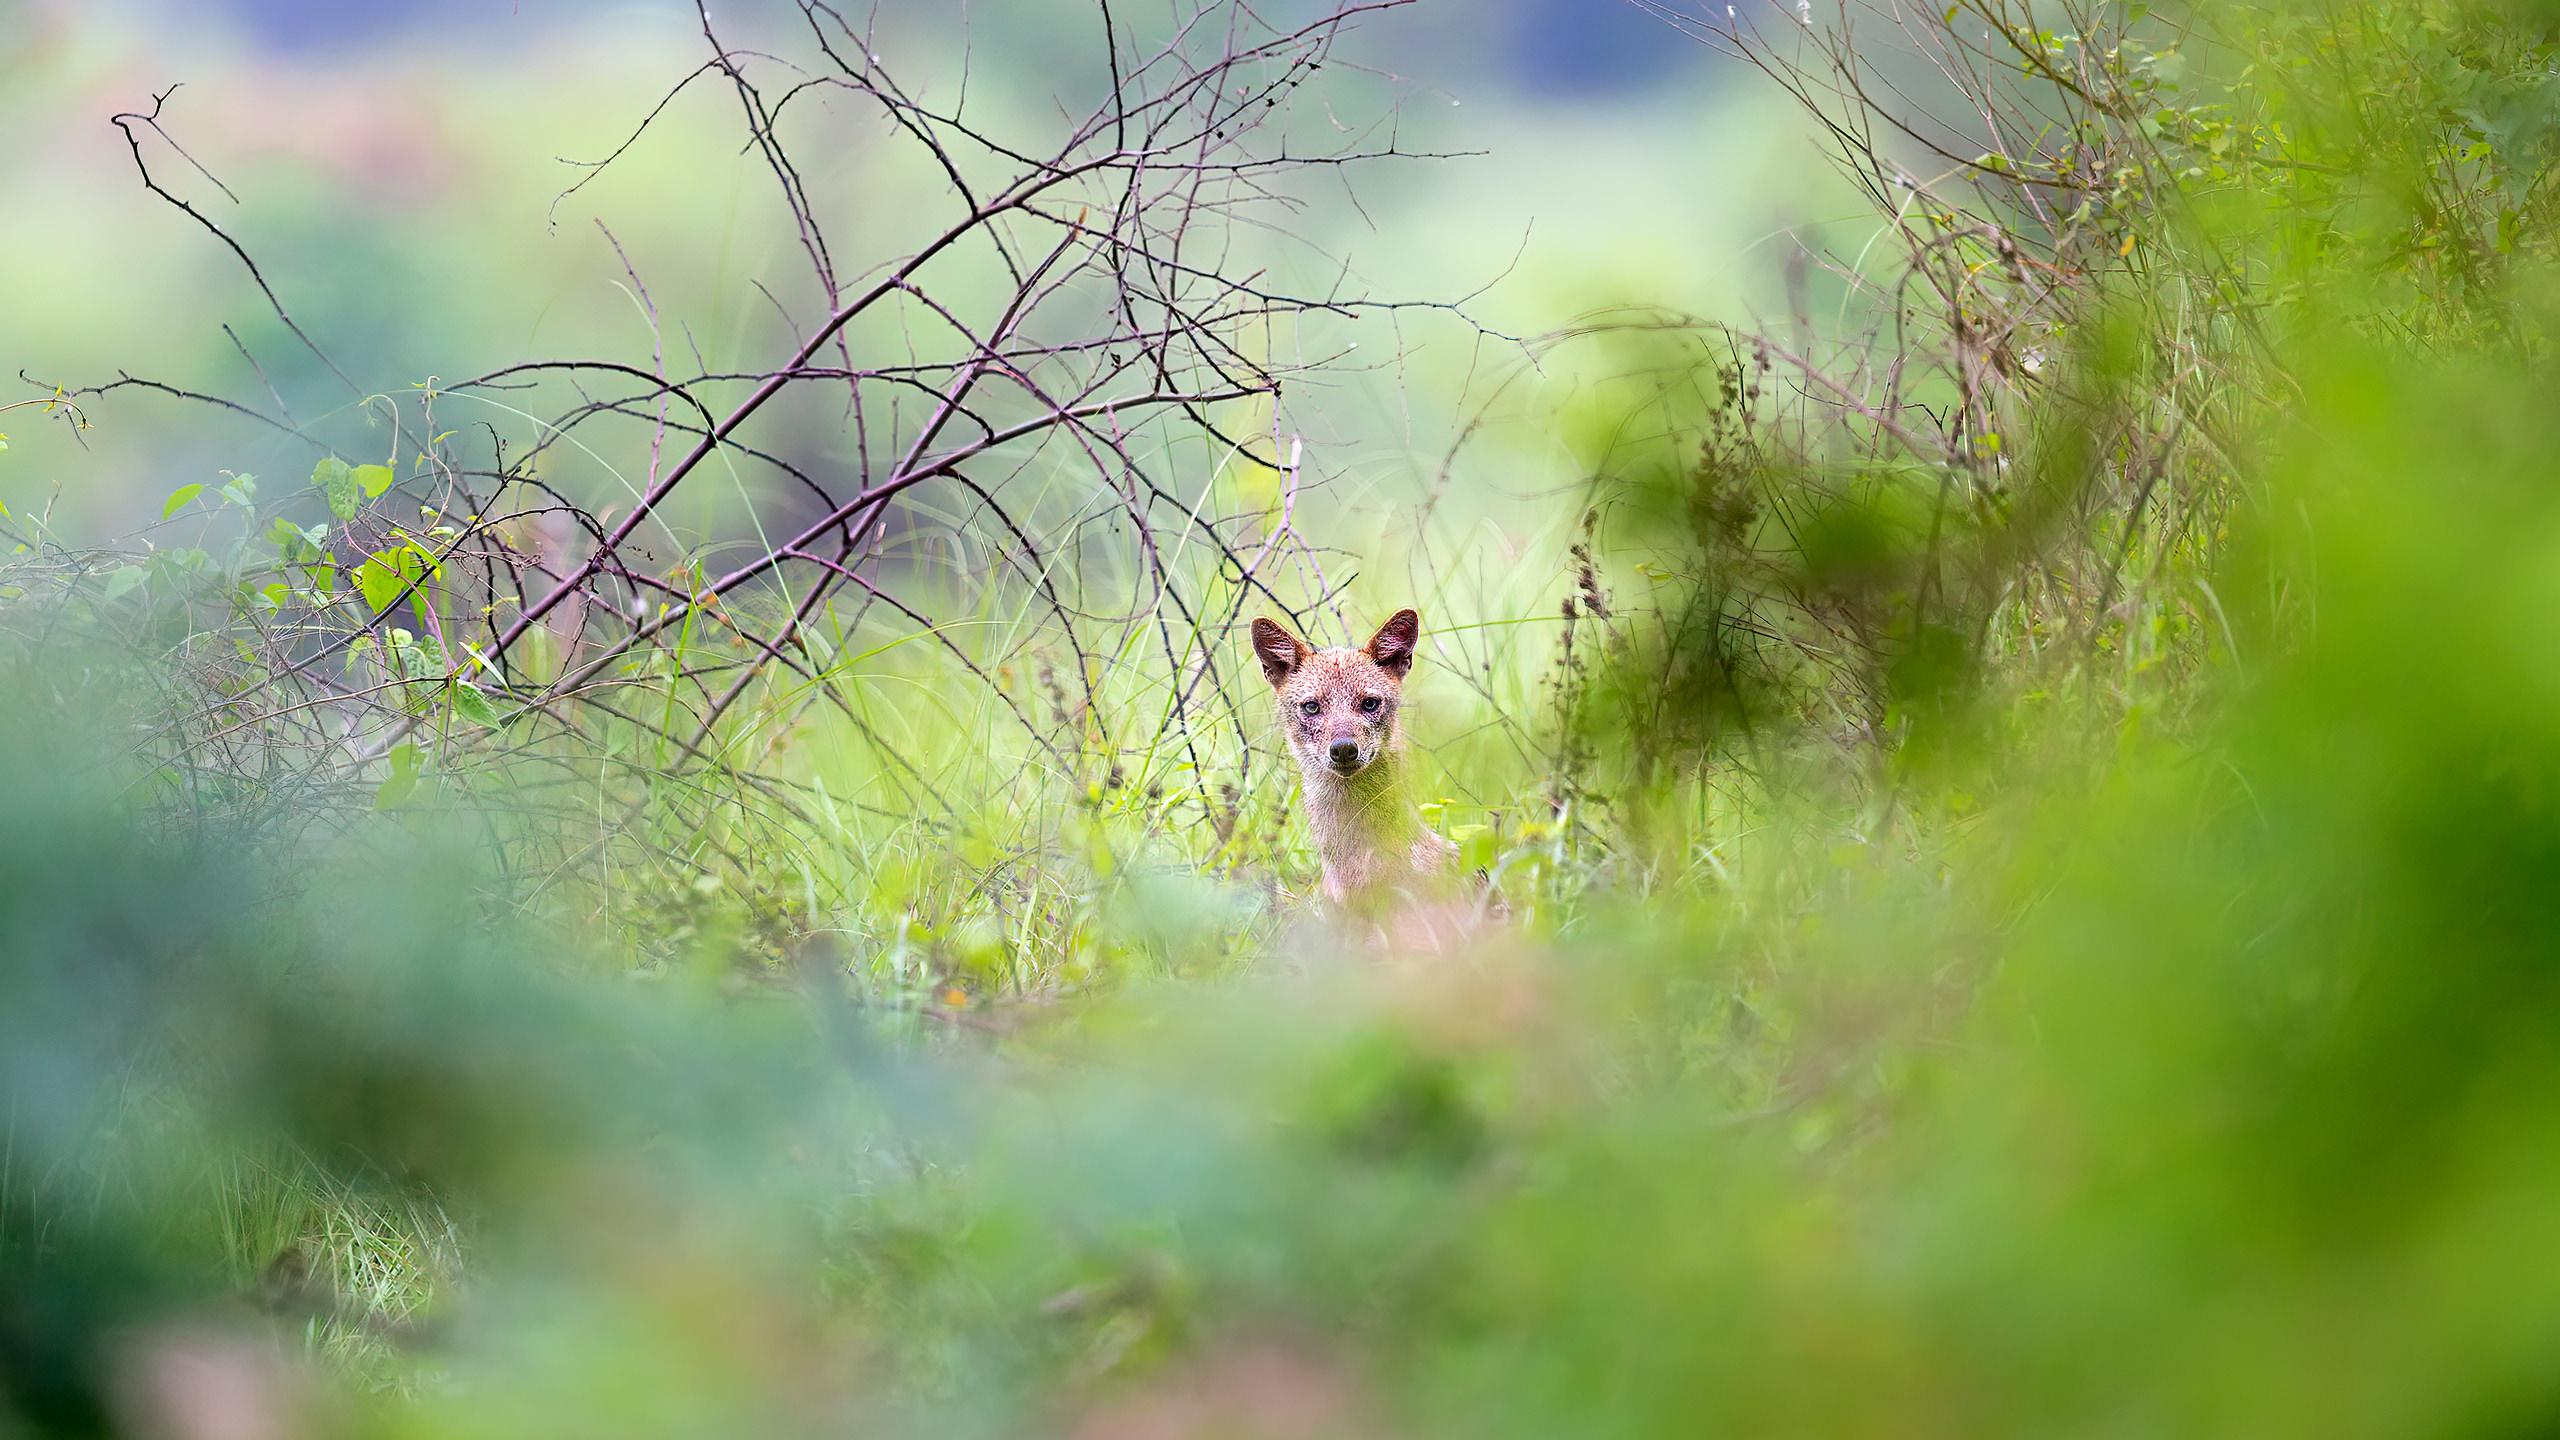 golden jackal or indian jackal India by Arindam Bhattacharya